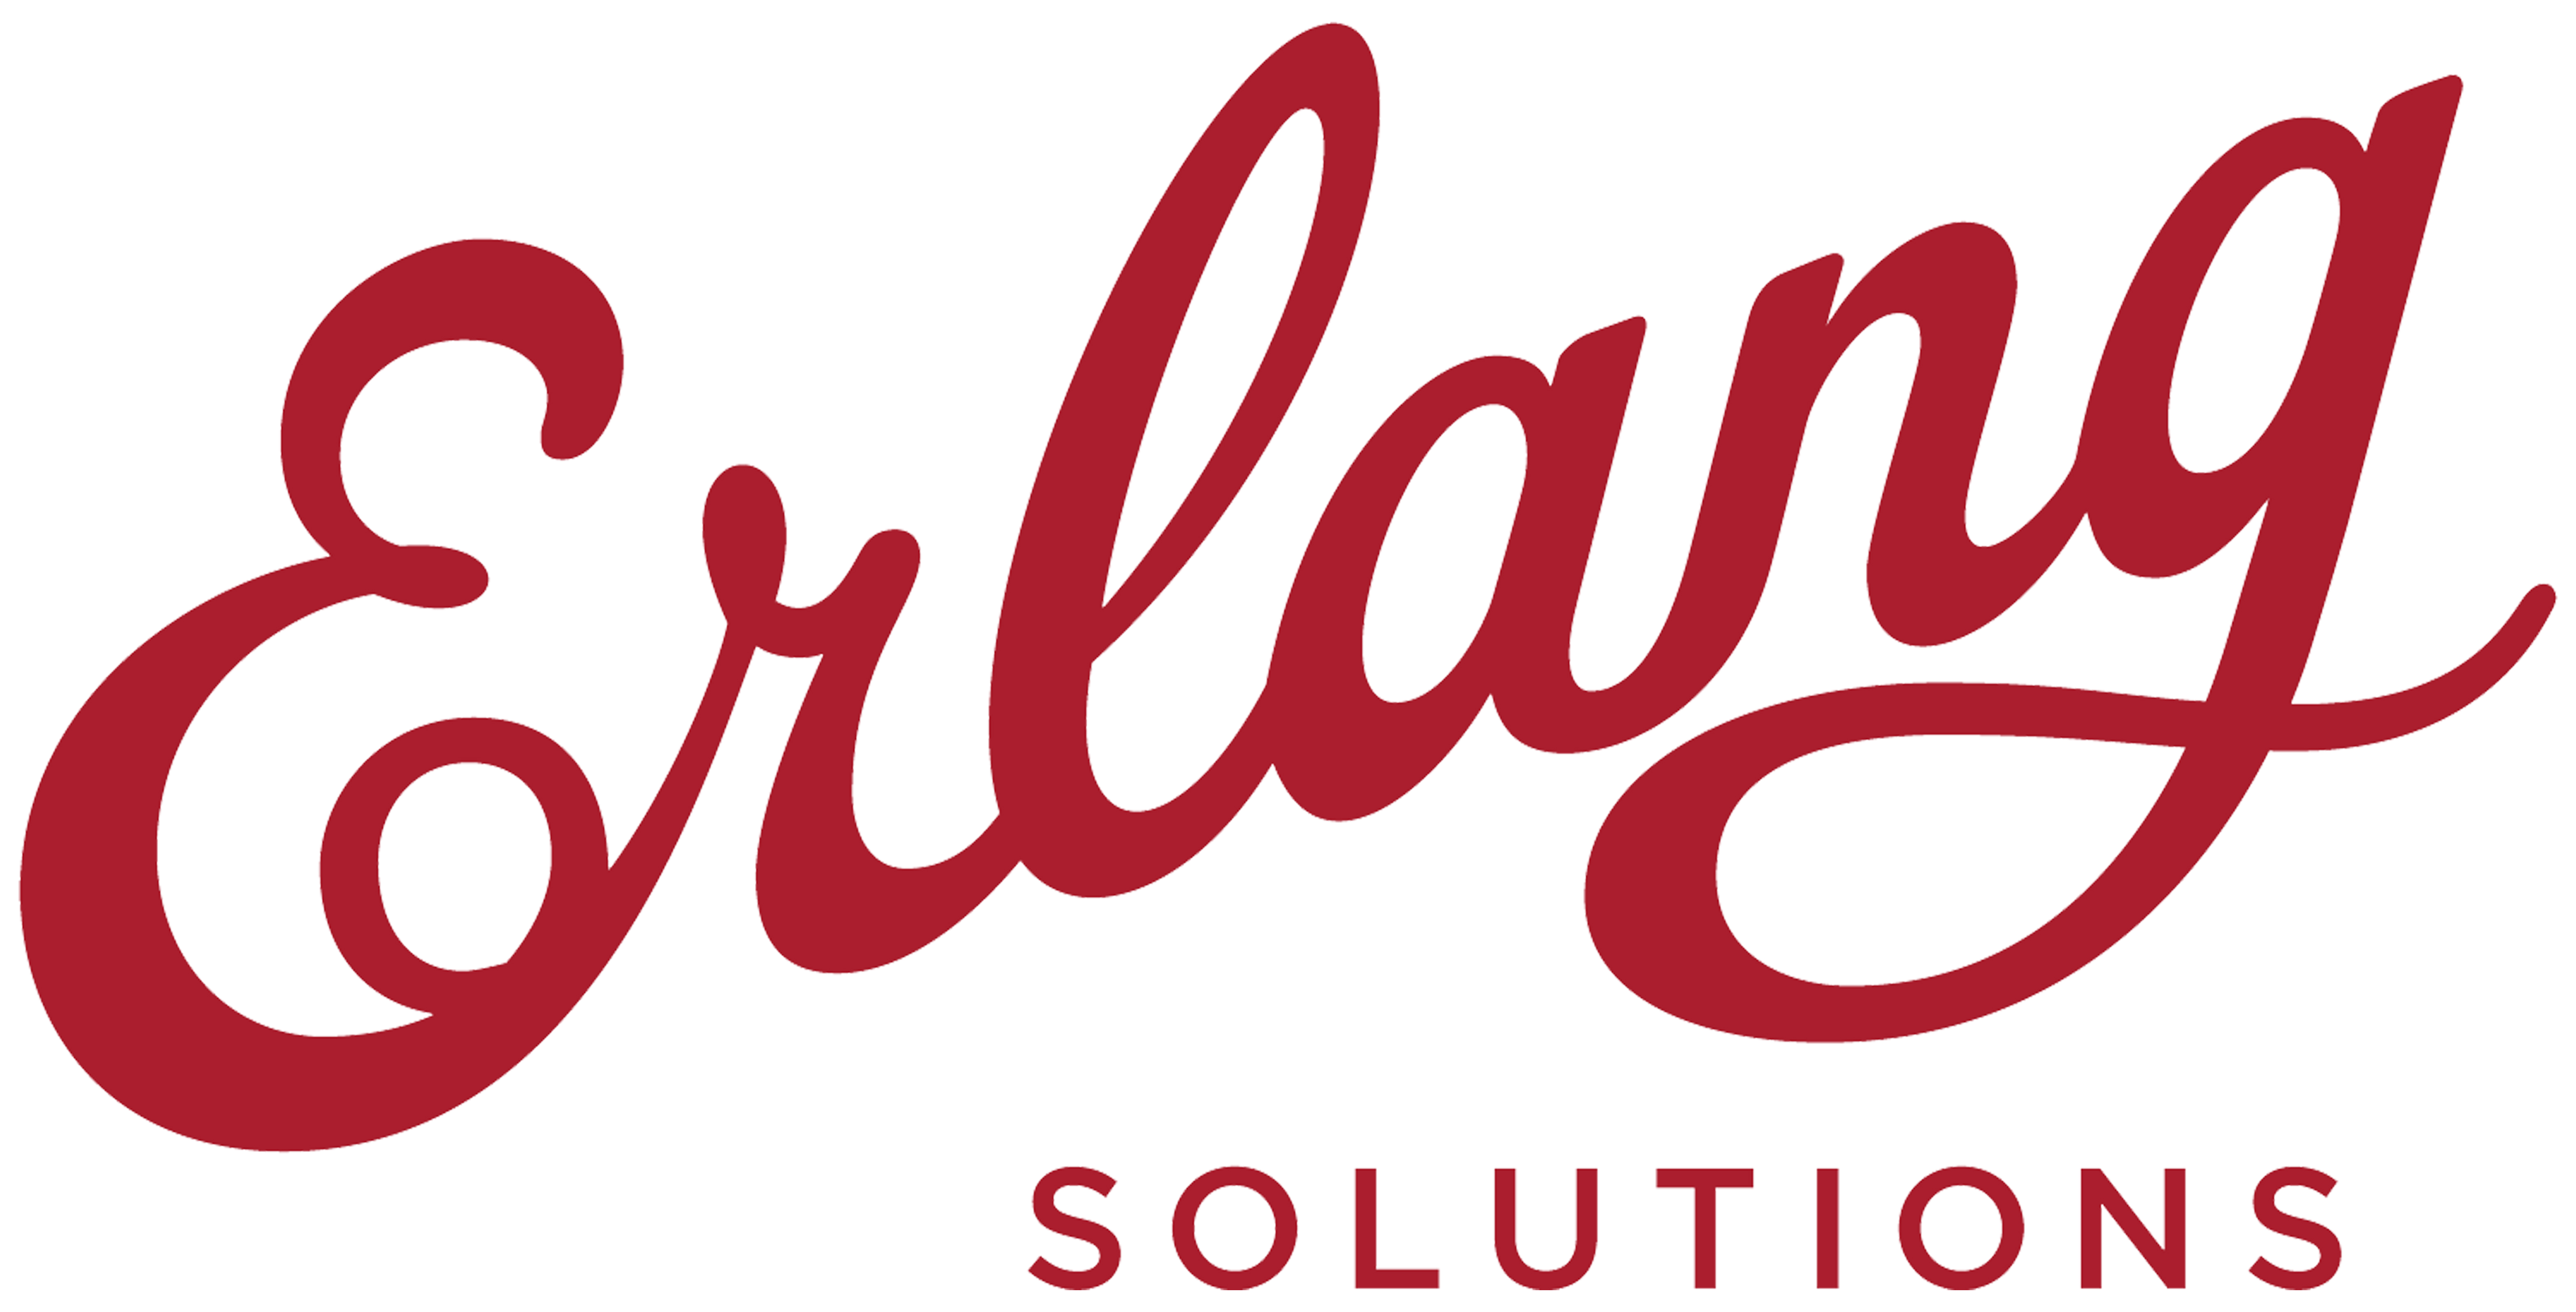 Erlang Solutions